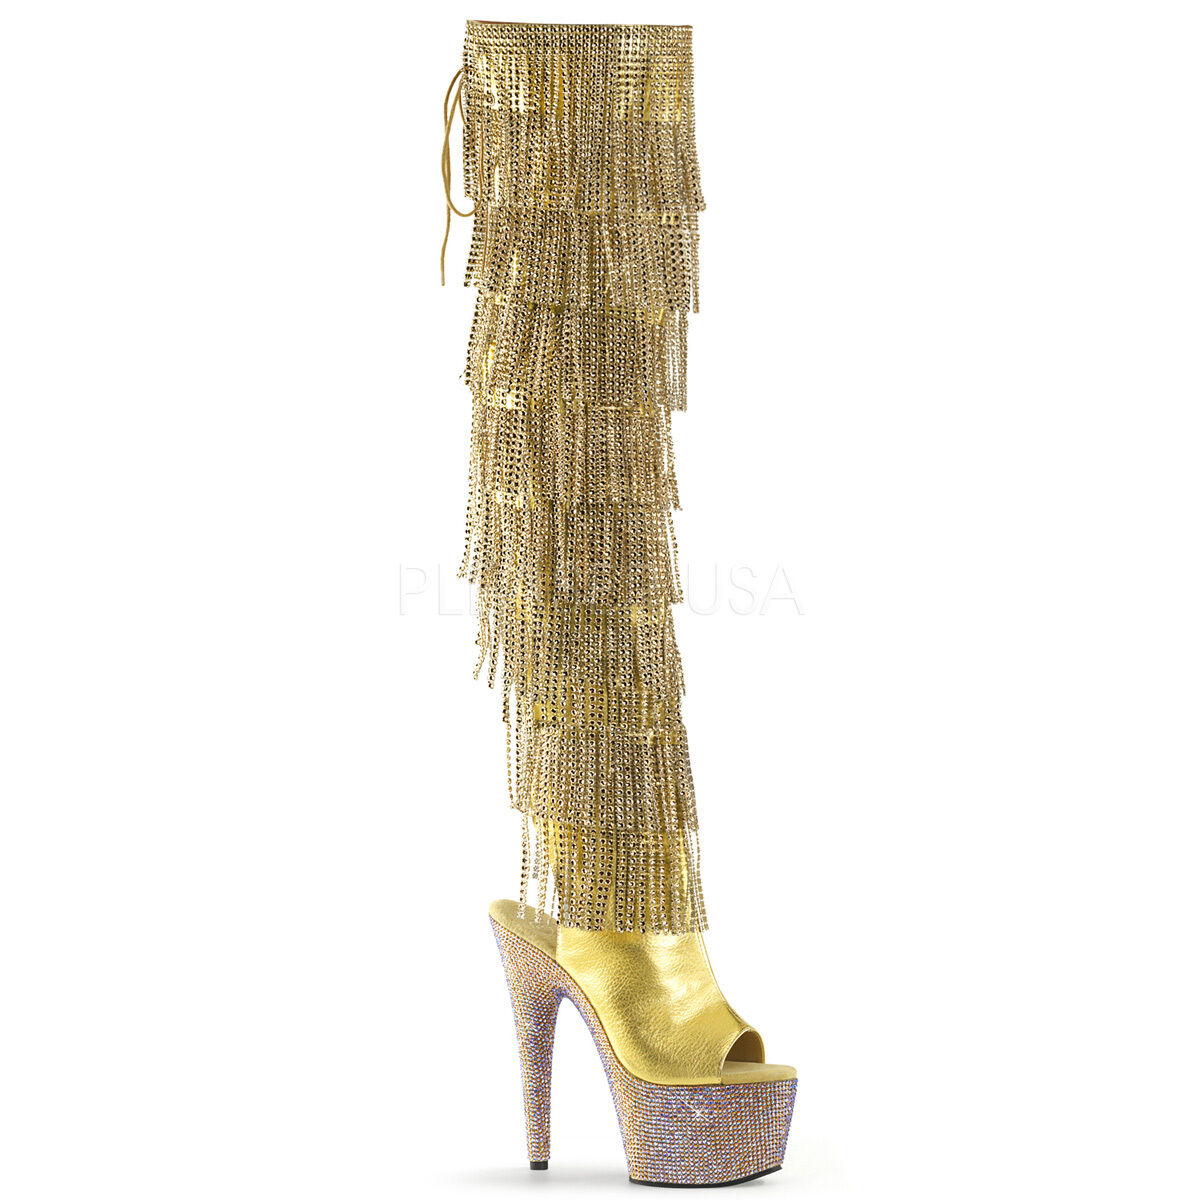 Bejeweled 3019 gold Fringe Thigh High Boot 7  Heel Rhinestone Platform 5-10